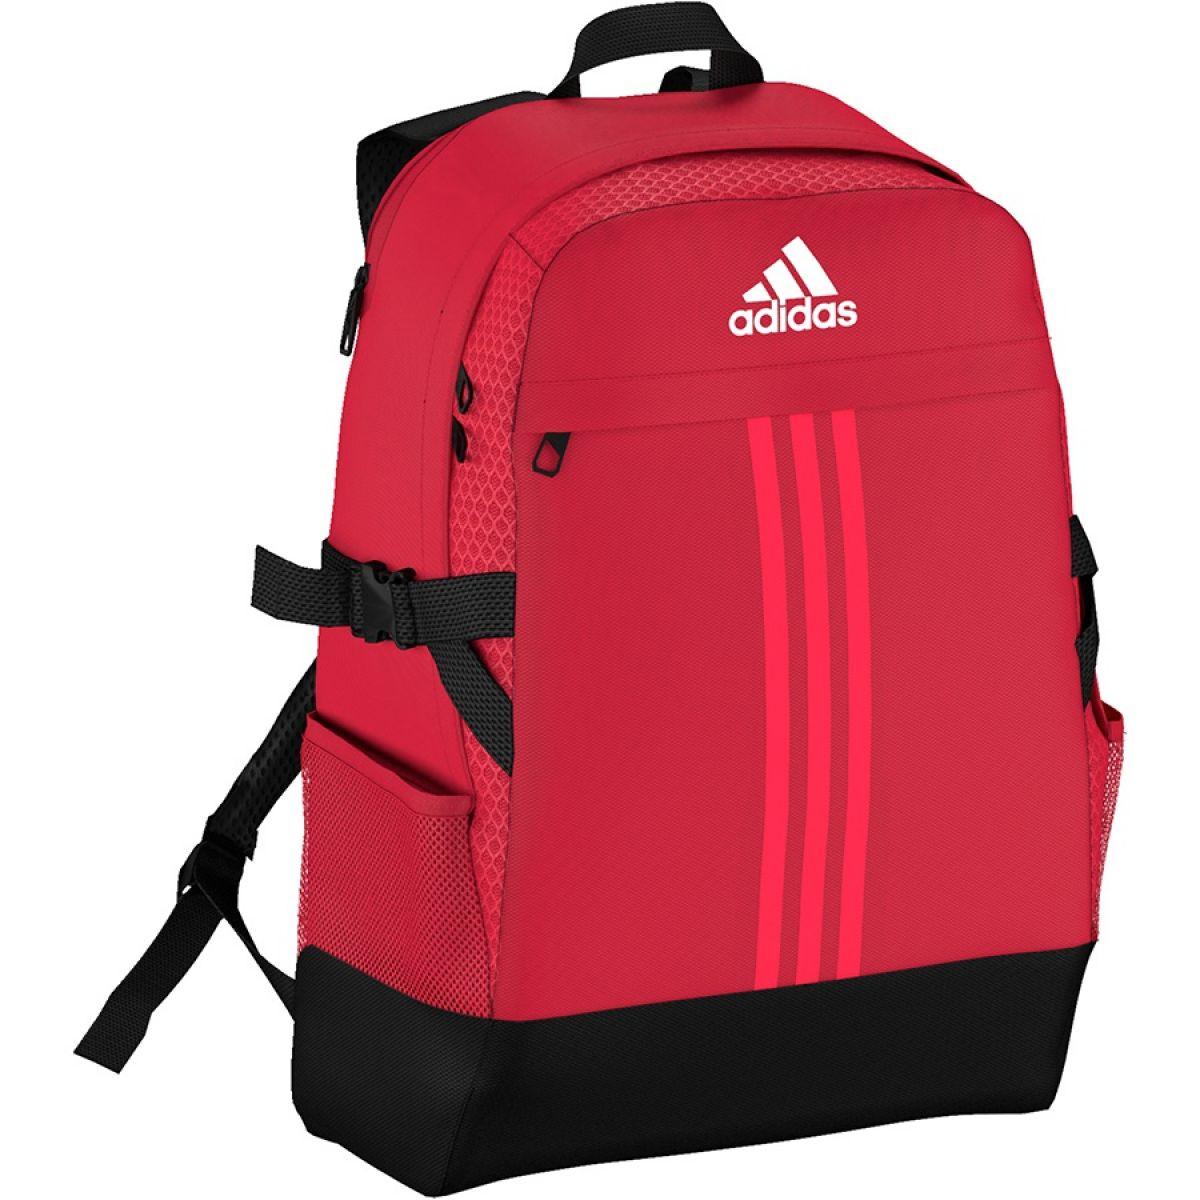 6e917d0ffed7b Plecak adidas Power 3 M AY5094 27 L - 7232677450 - oficjalne ...